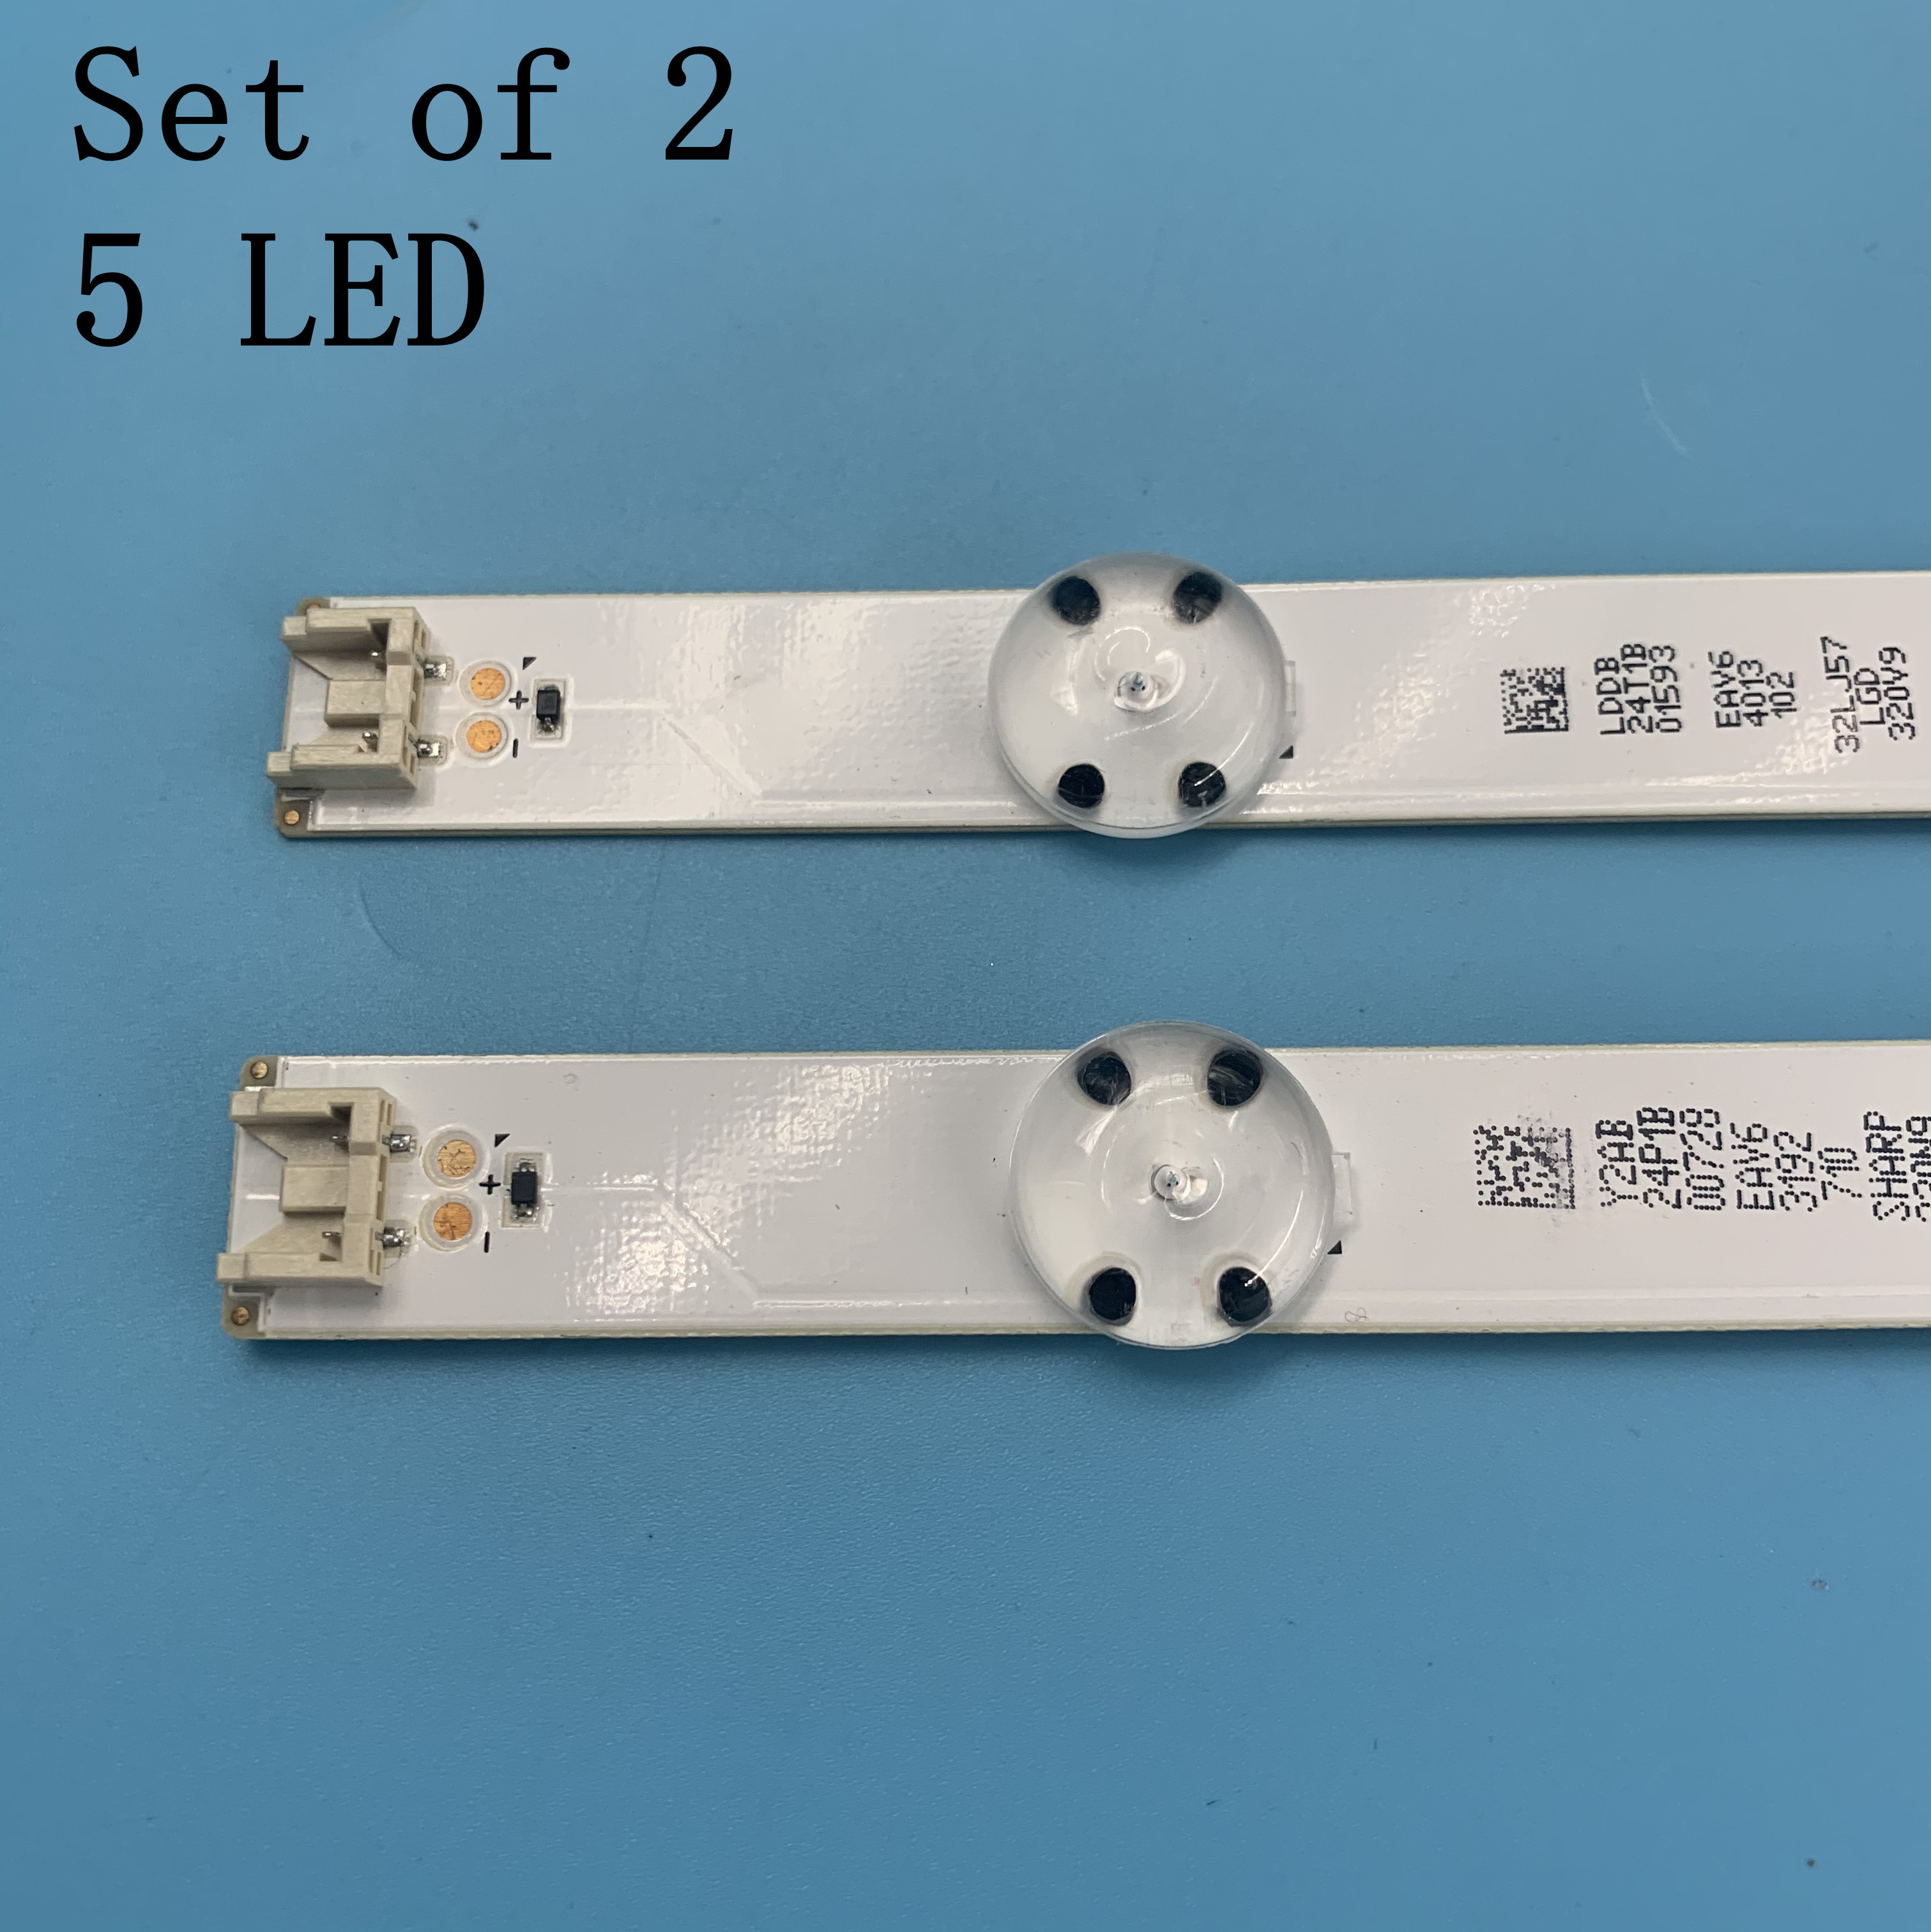 2pcs 5LEDs 590mm LED Strip For LG TV 32LH510B 32LH51_HD S SSC_32INCH_HD LGE_WICOP_SVL320AL5 Innotek Direct 32inch CSP